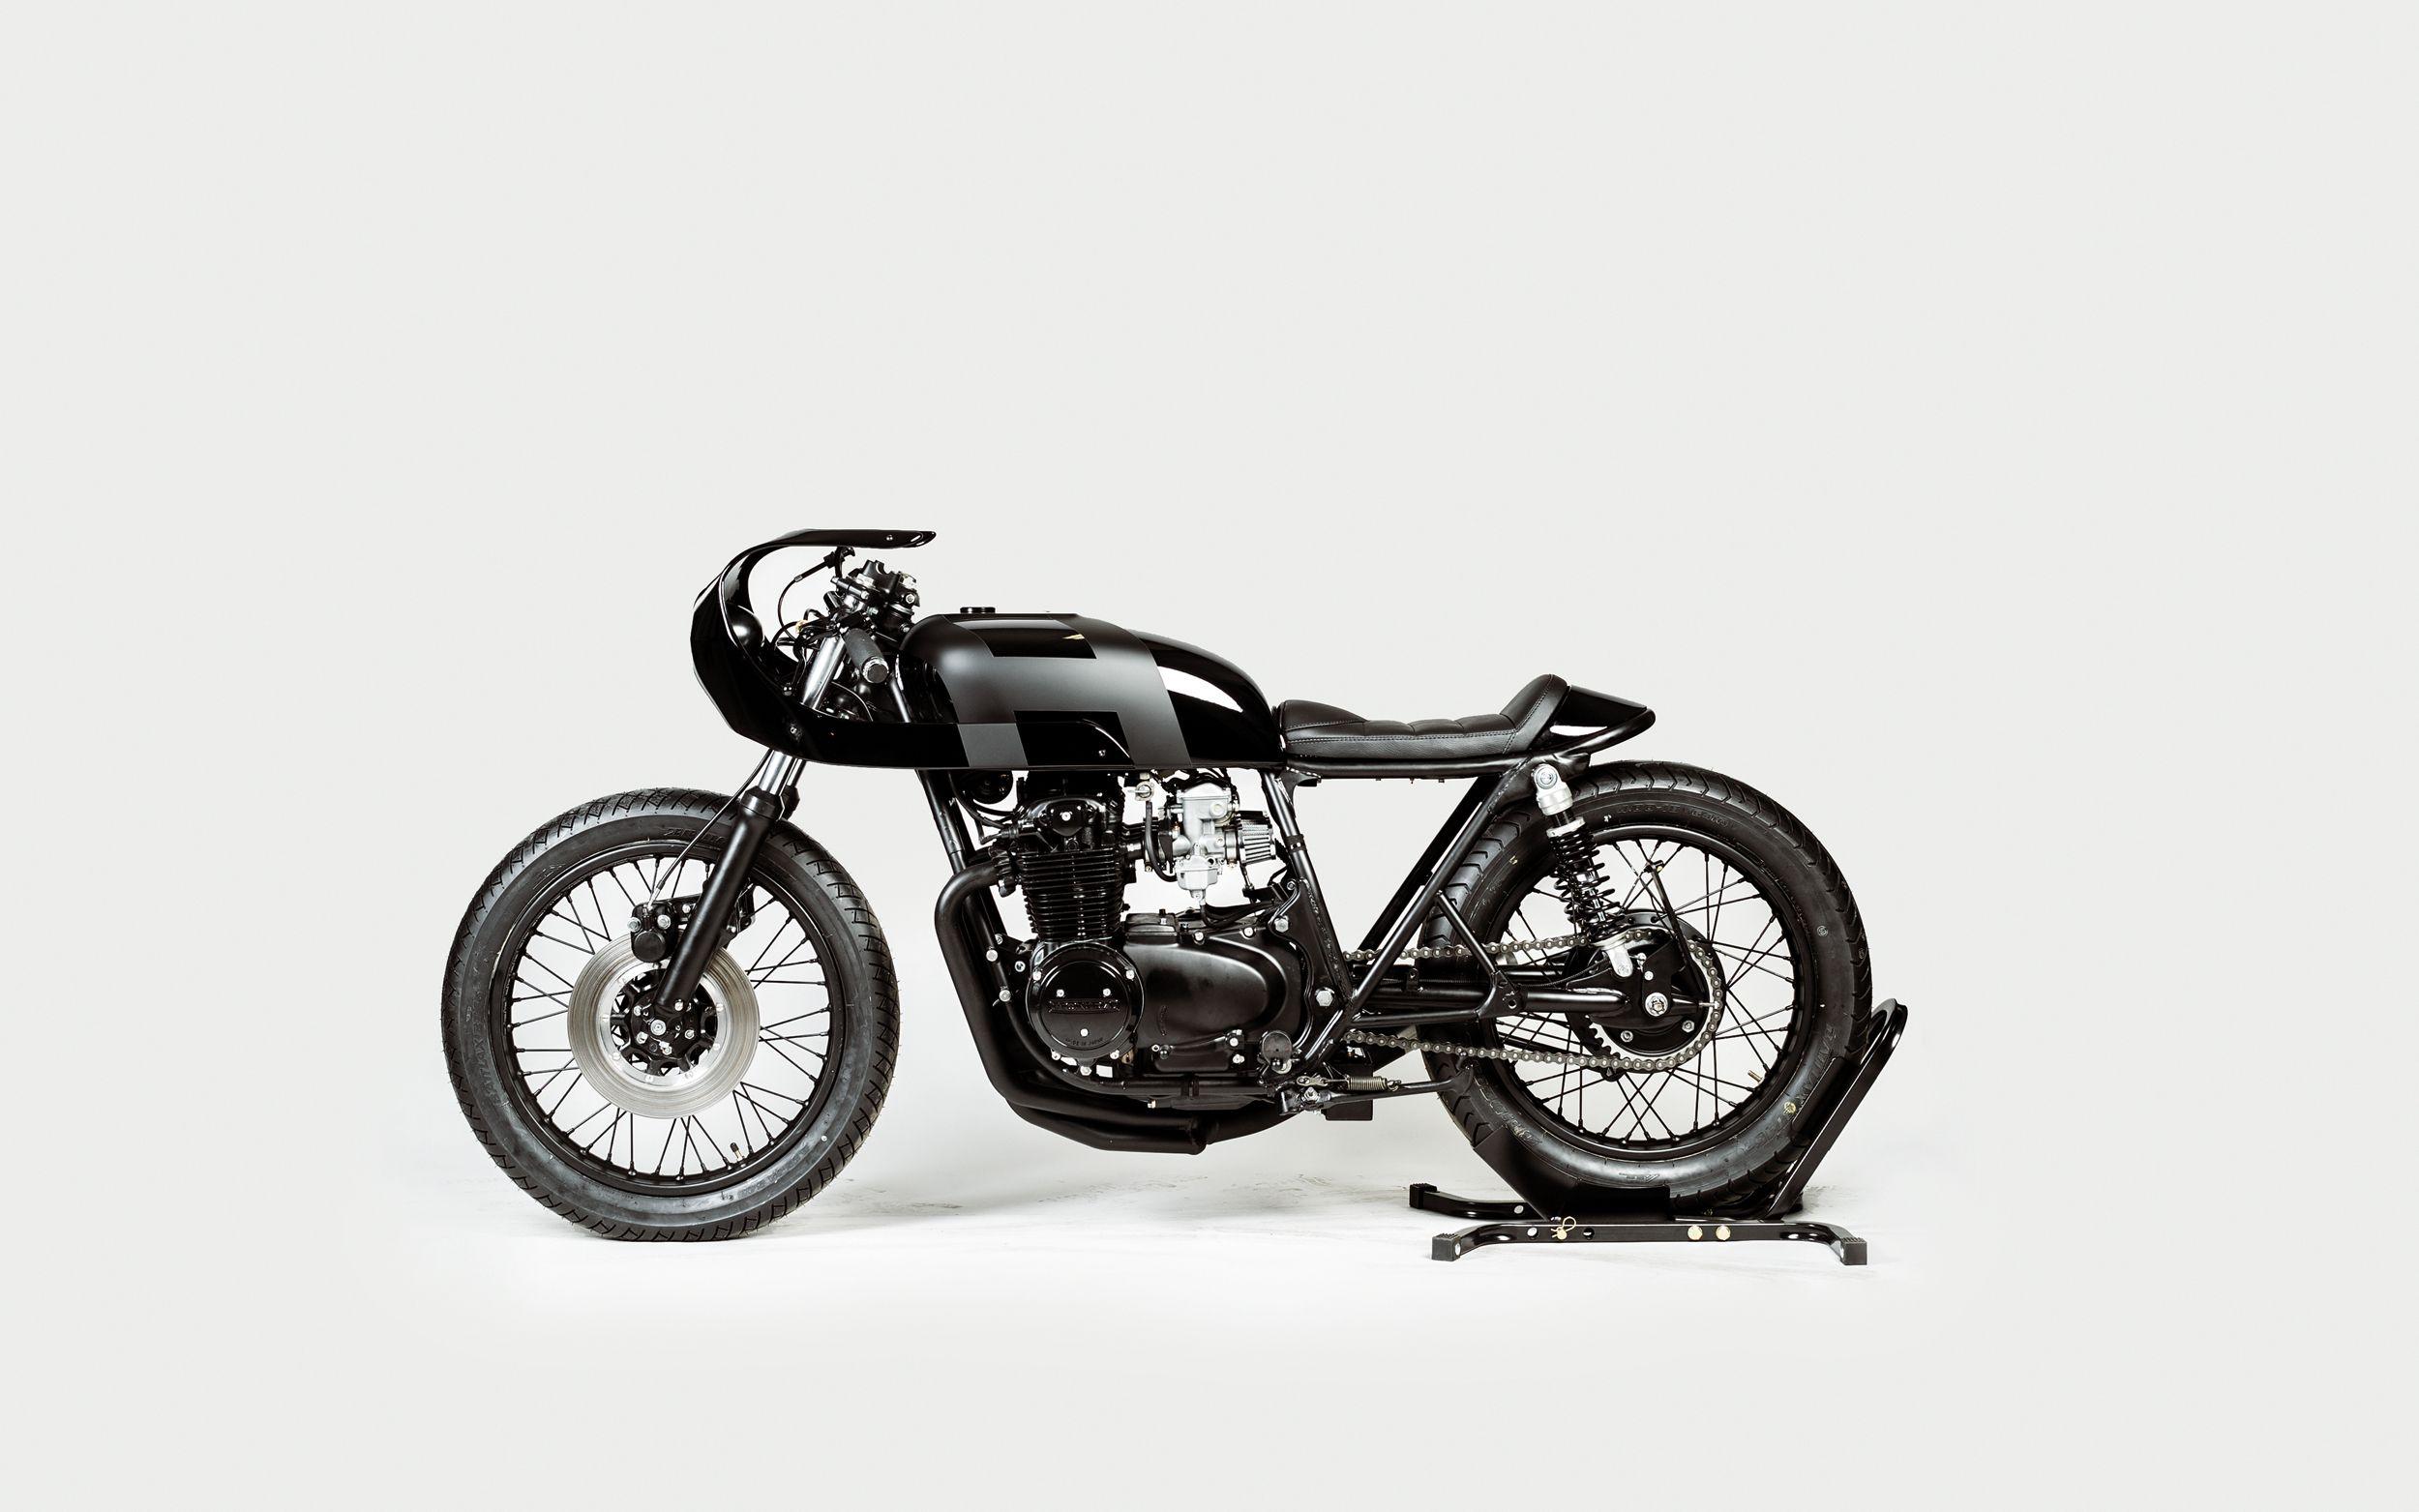 Black Mamba - 1973 Honda CB550 motorcycle by Hookie.com